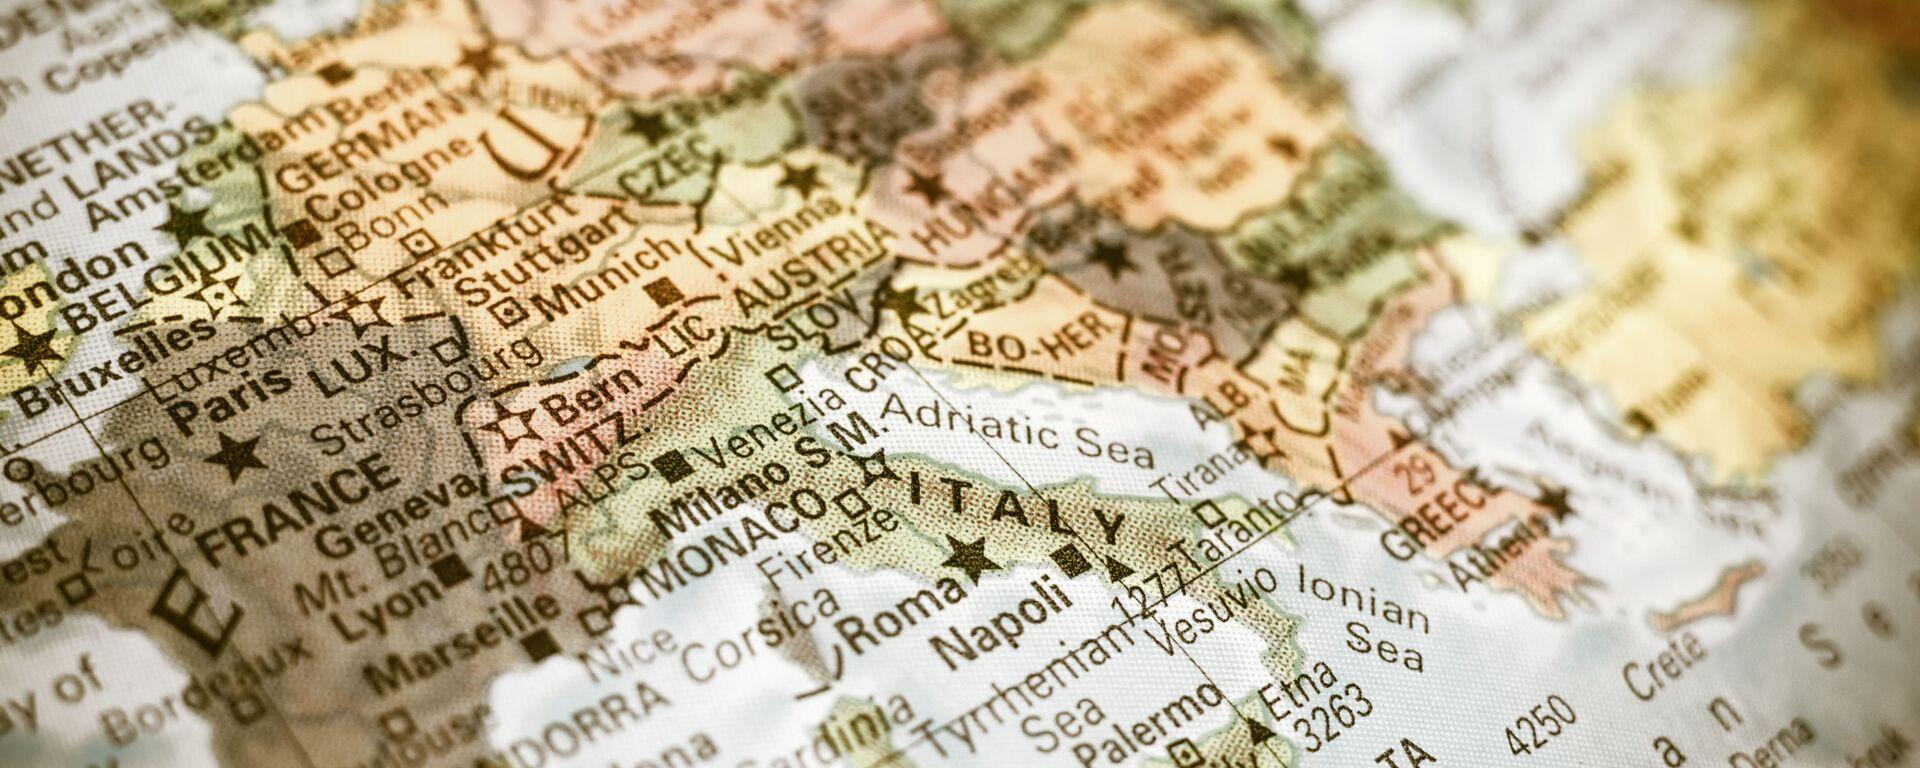 La mappa del Mediterraneo - Sputnik Italia, 1920, 11.05.2020